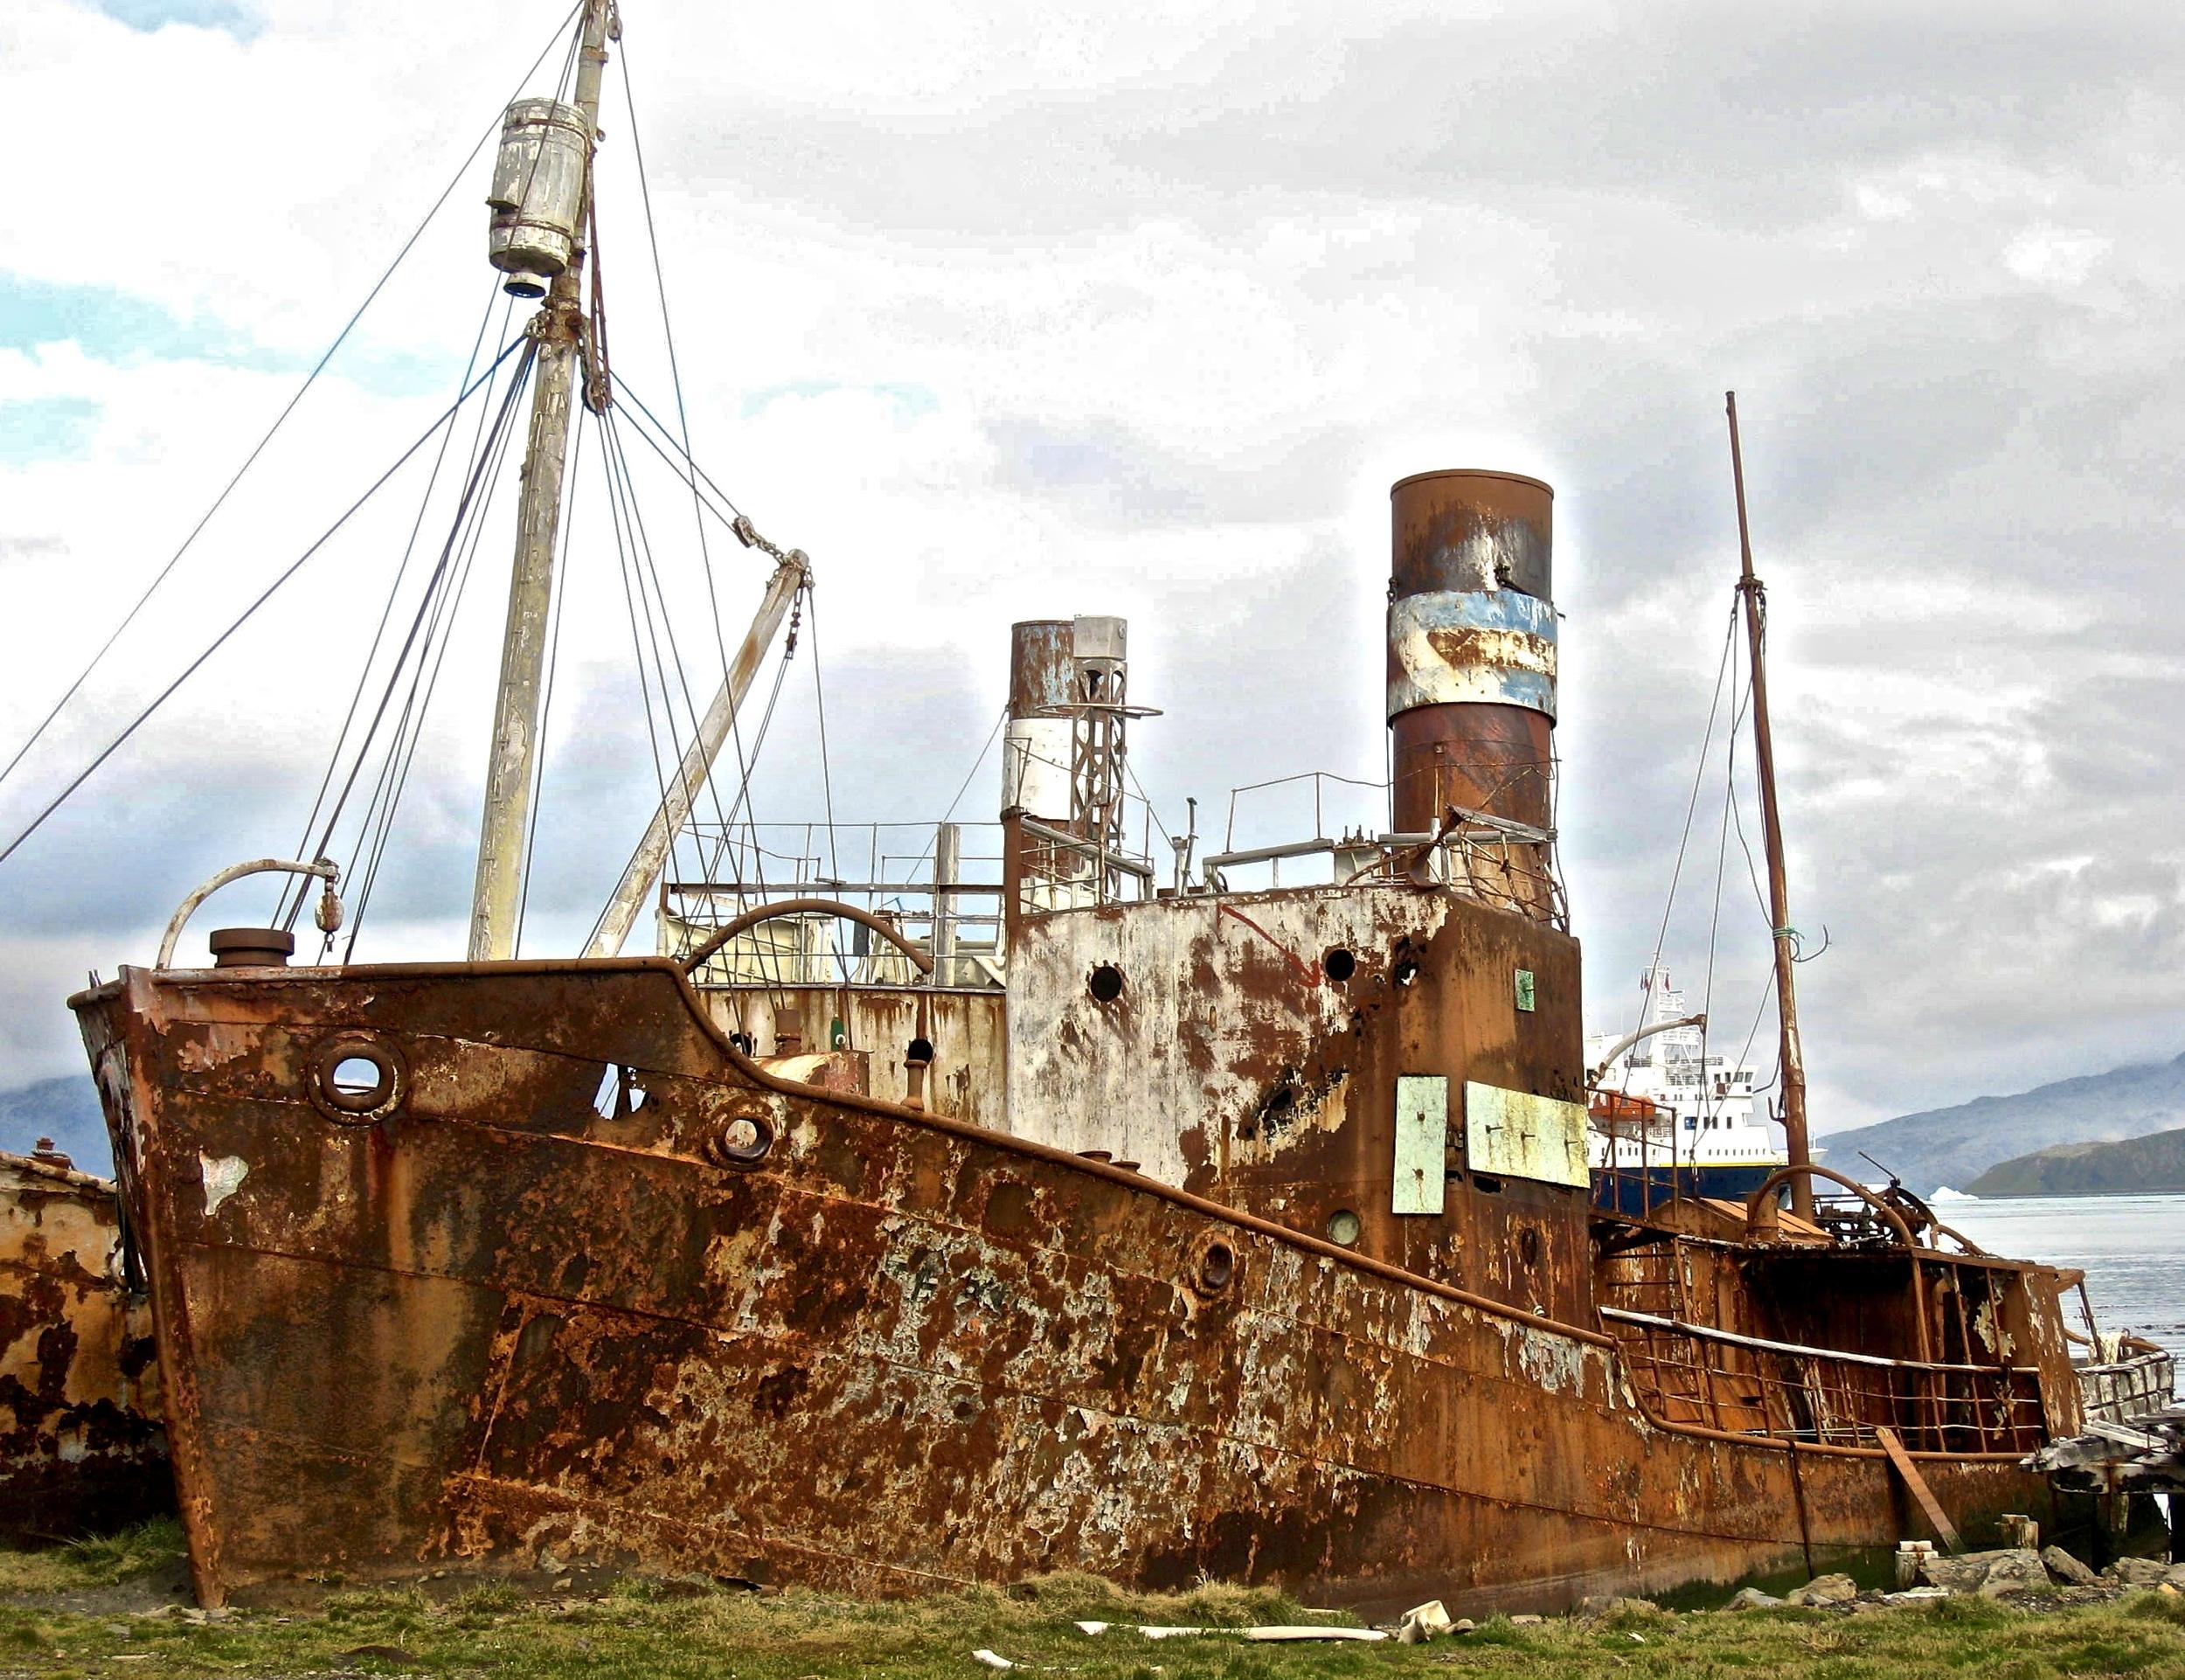 Many Rusting Ship Wrecks in Antarctica